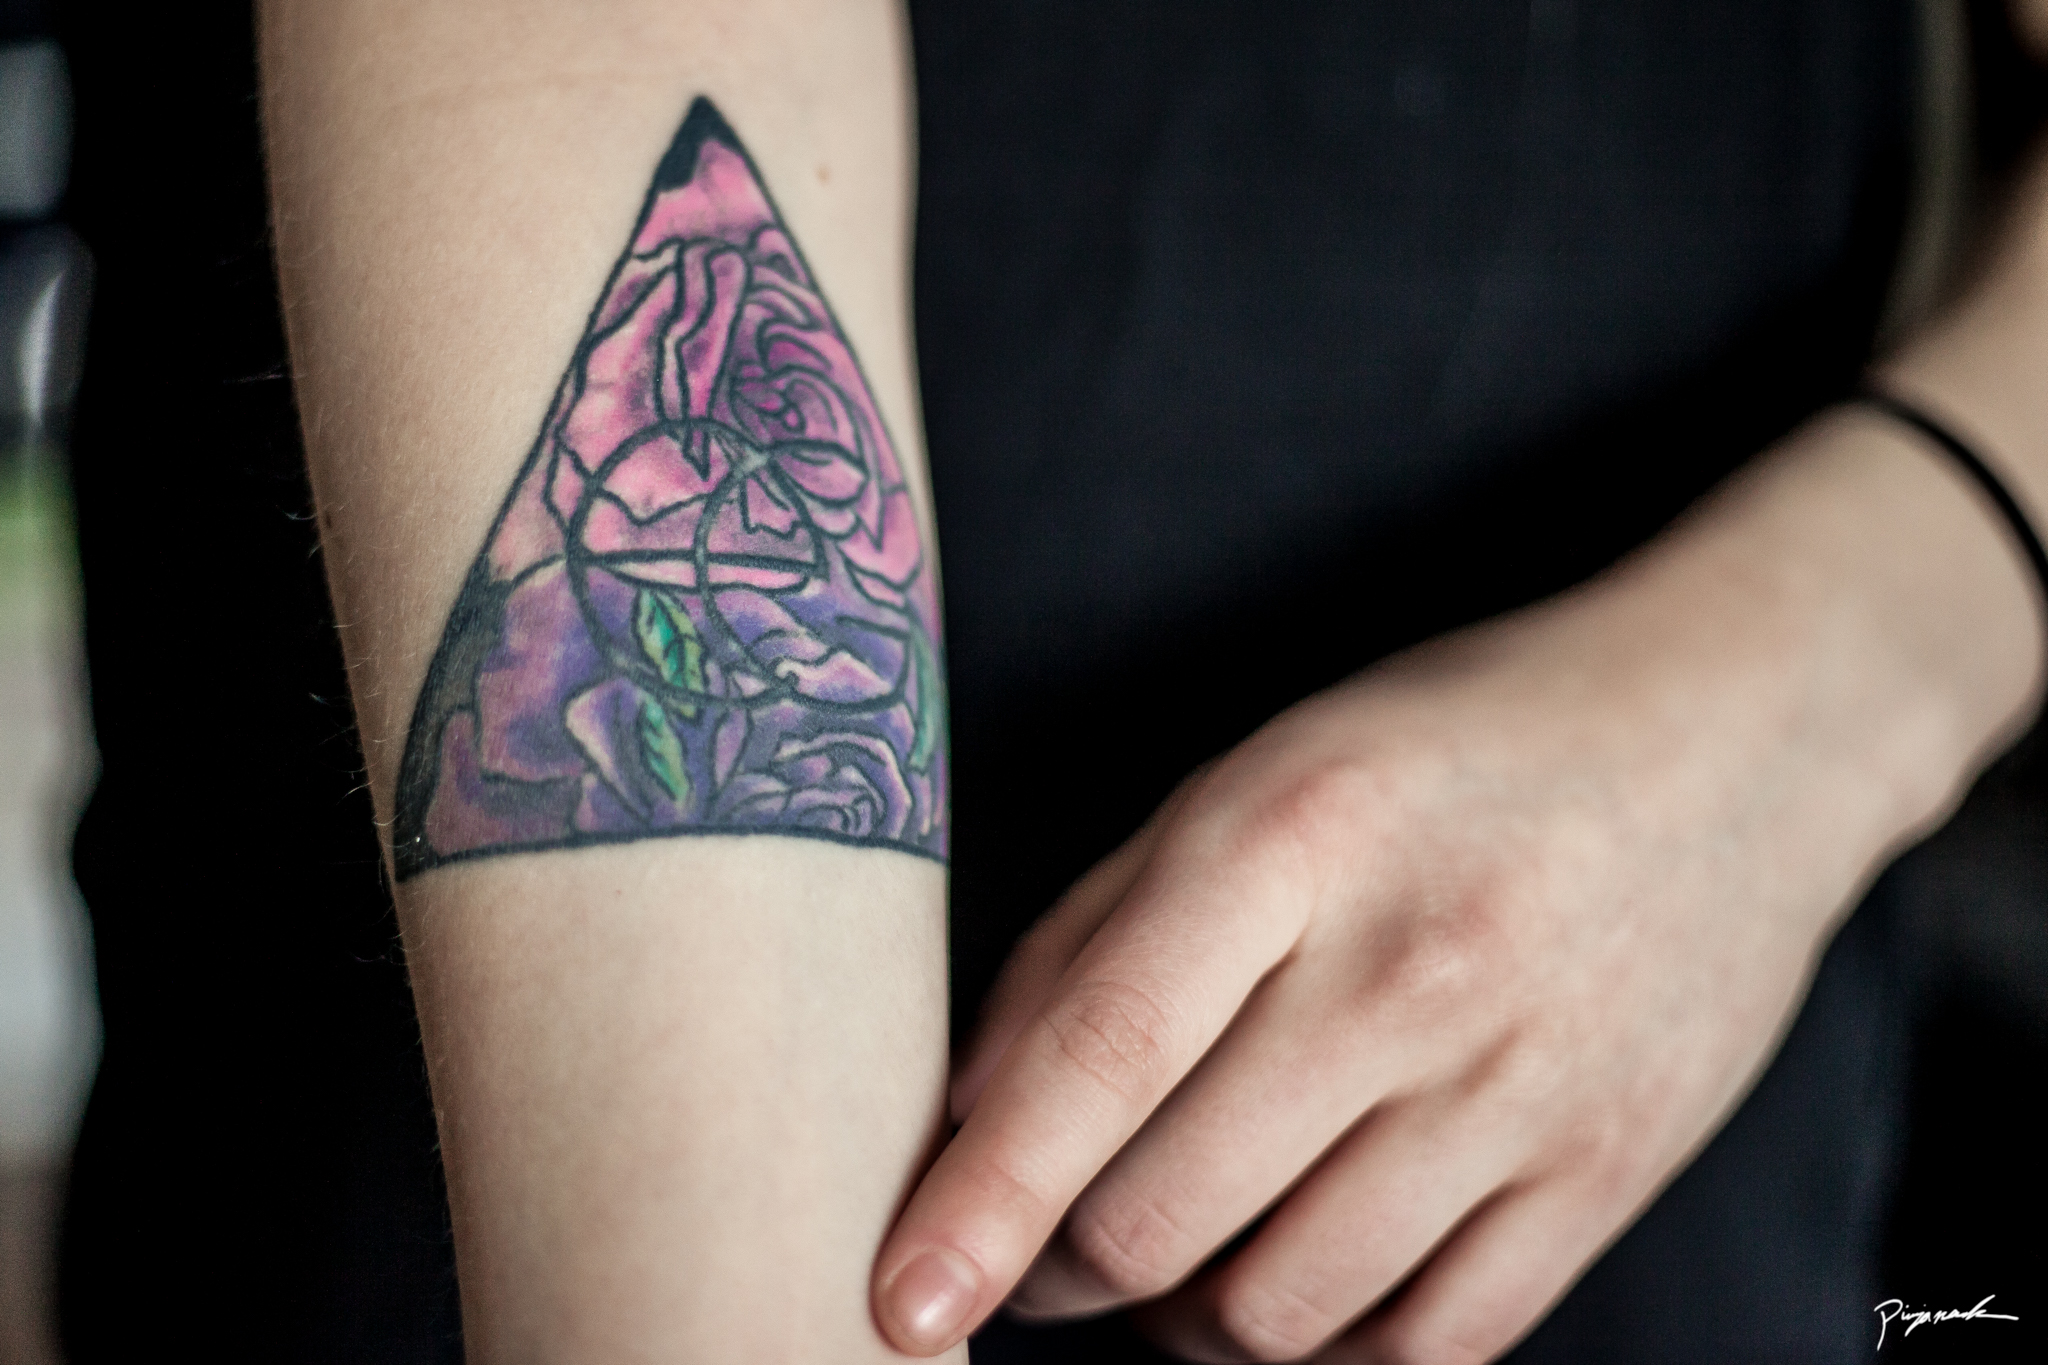 Tattooed Bear Stepfather